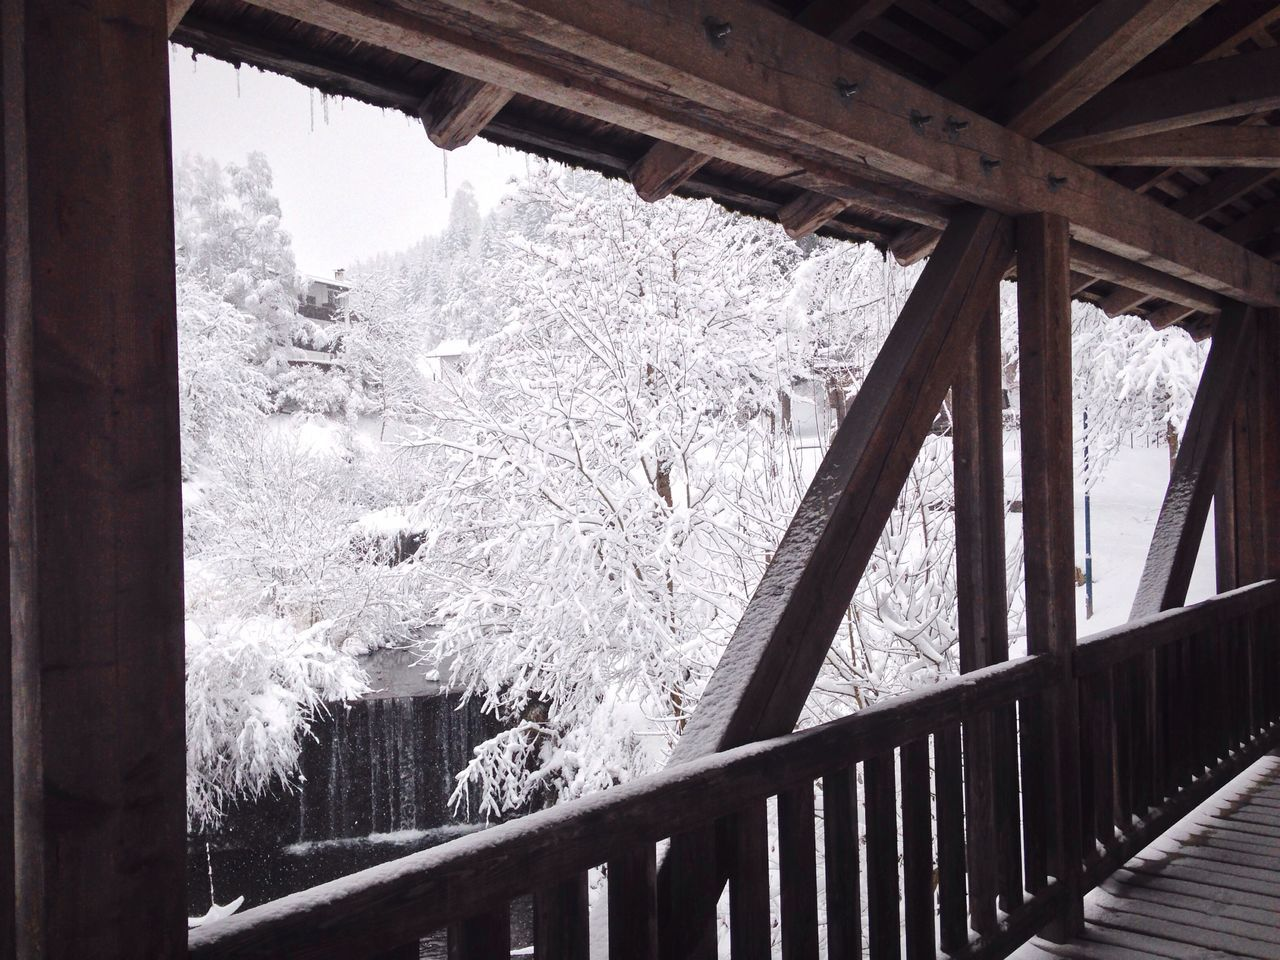 Water Wood Colonnade Snow Winter Wintertime Frozen Nature Tree Forest White Südtirol Italy Alto Adige Trentino Alto Adige Nova Levante Welschnofen Cold Temperature South Tyrol Landscape